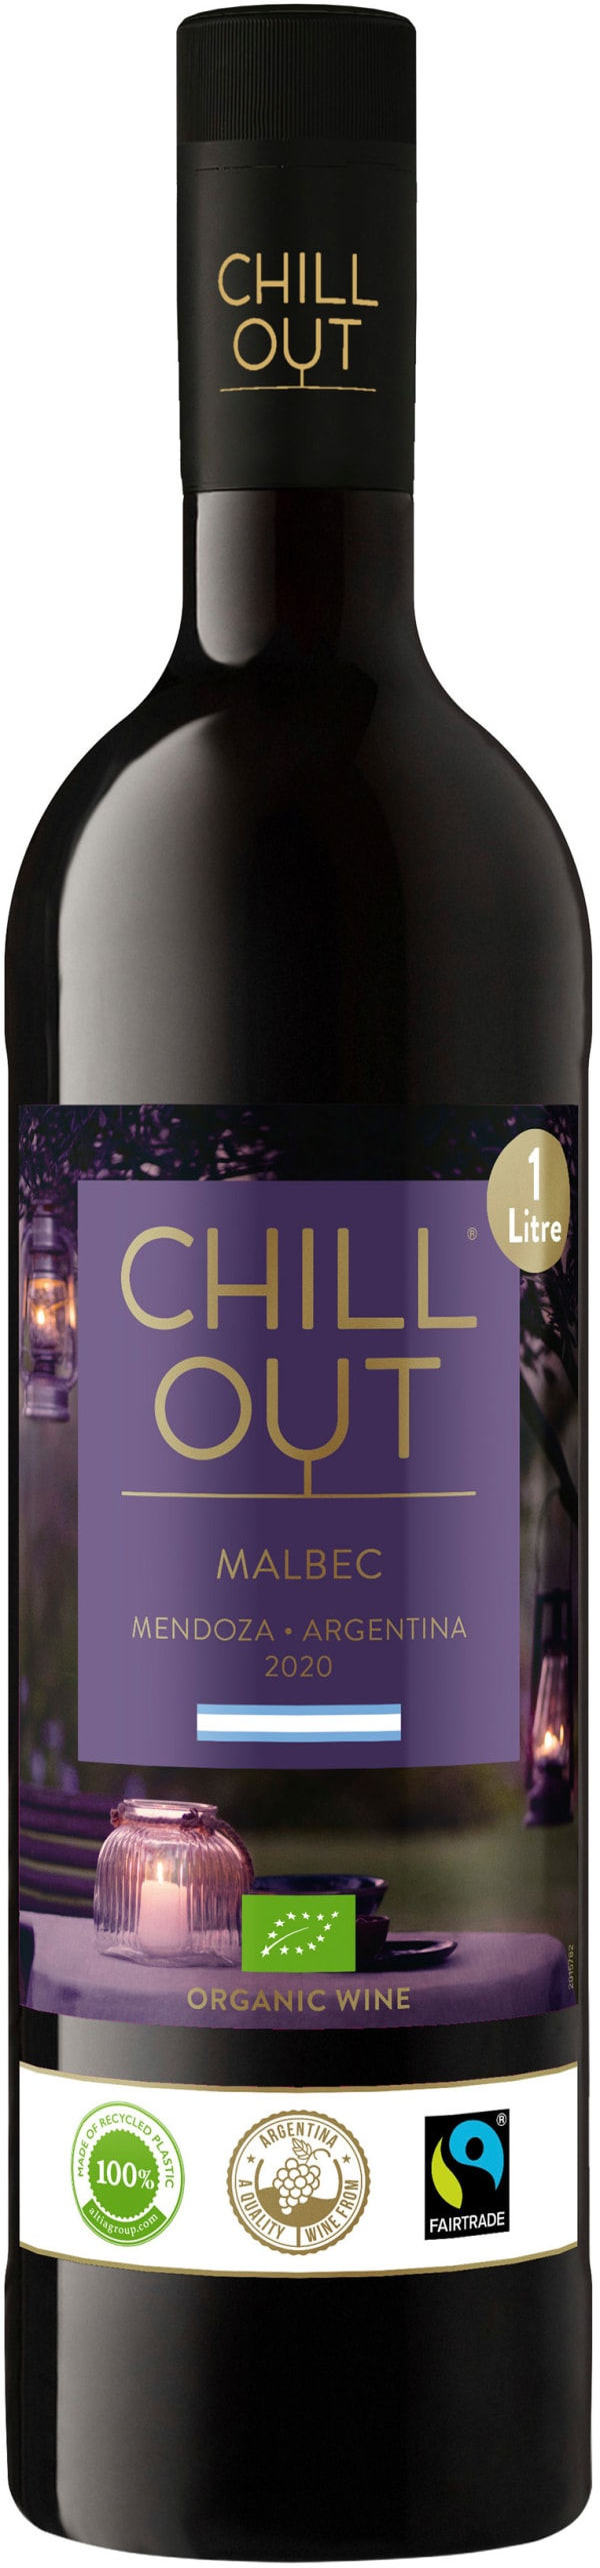 Chill Out Malbec Argentina 2018 plastflaska